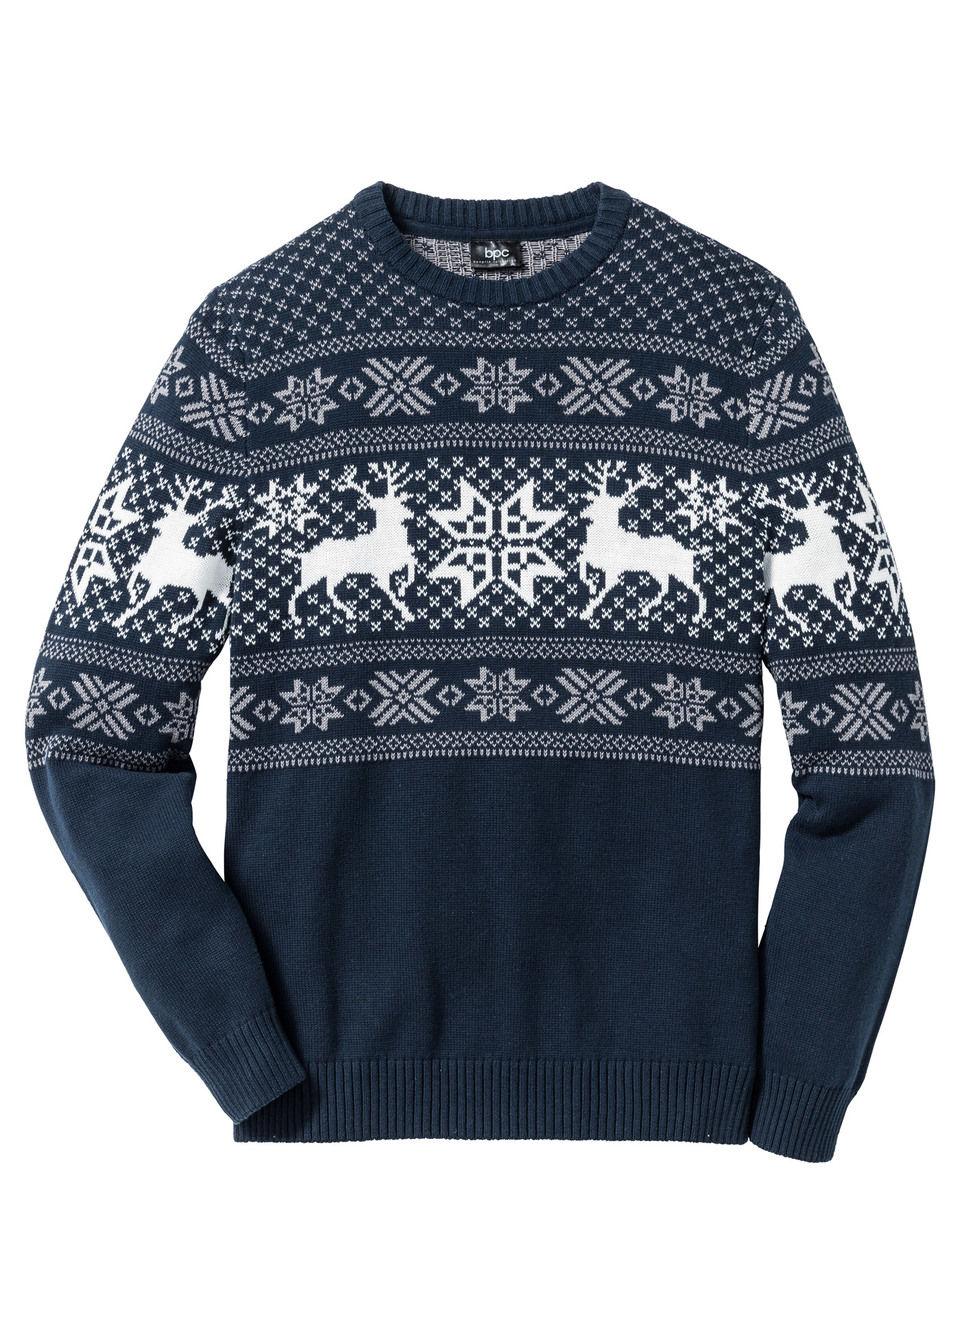 Купить Свитера, Пуловер с норвежским узором, bonprix, темно-синий